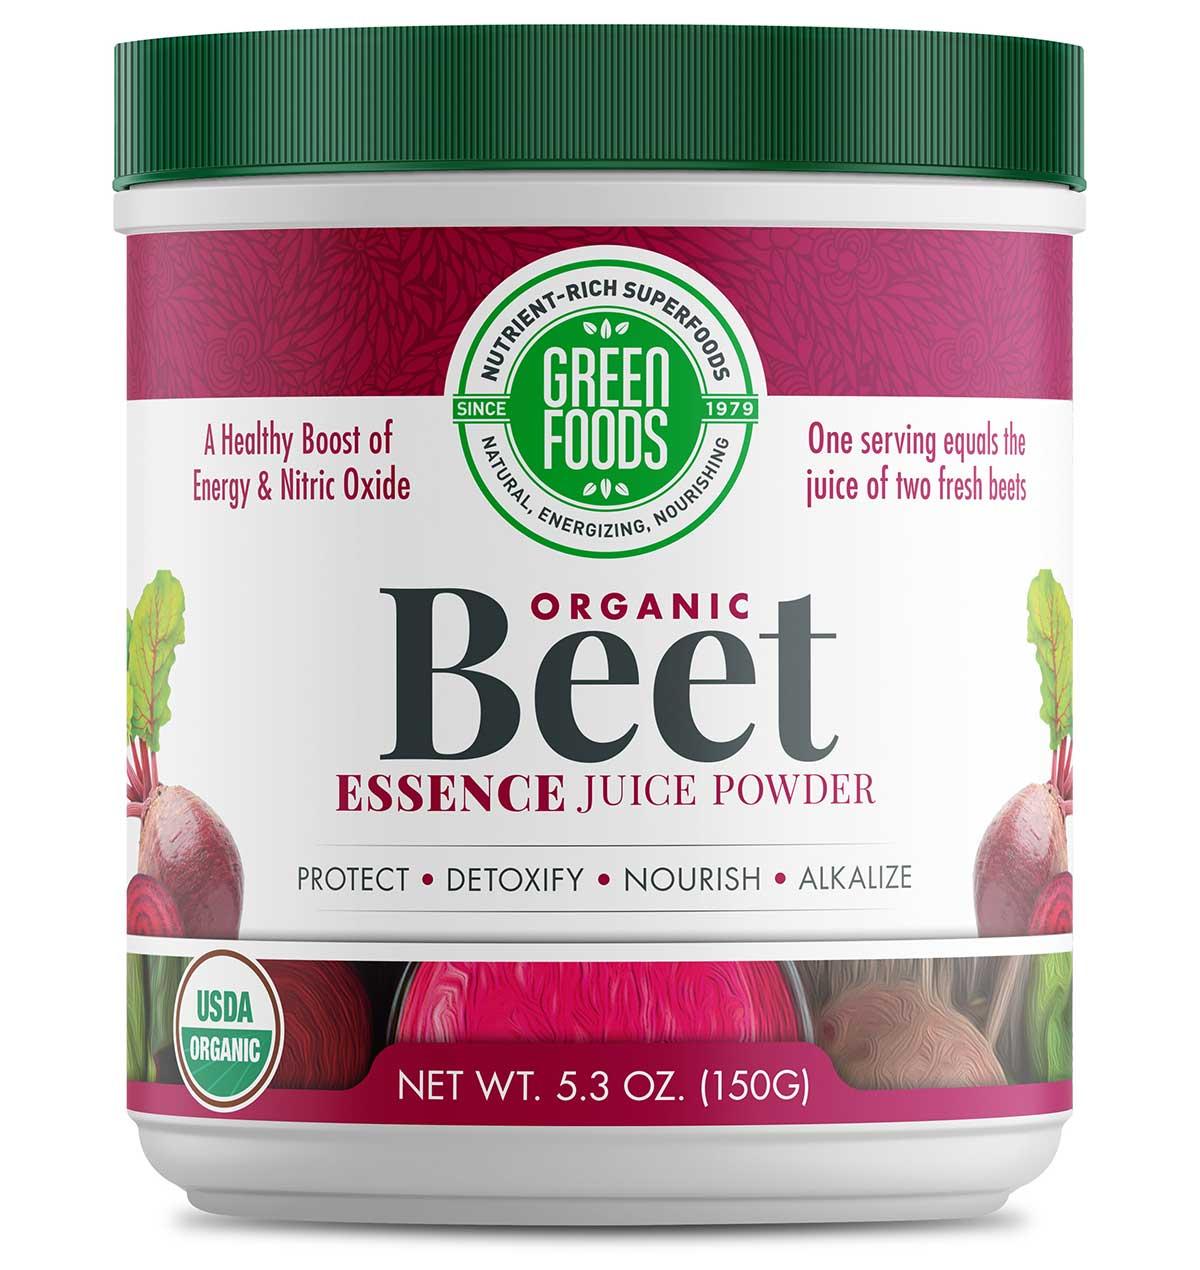 Beet Essence